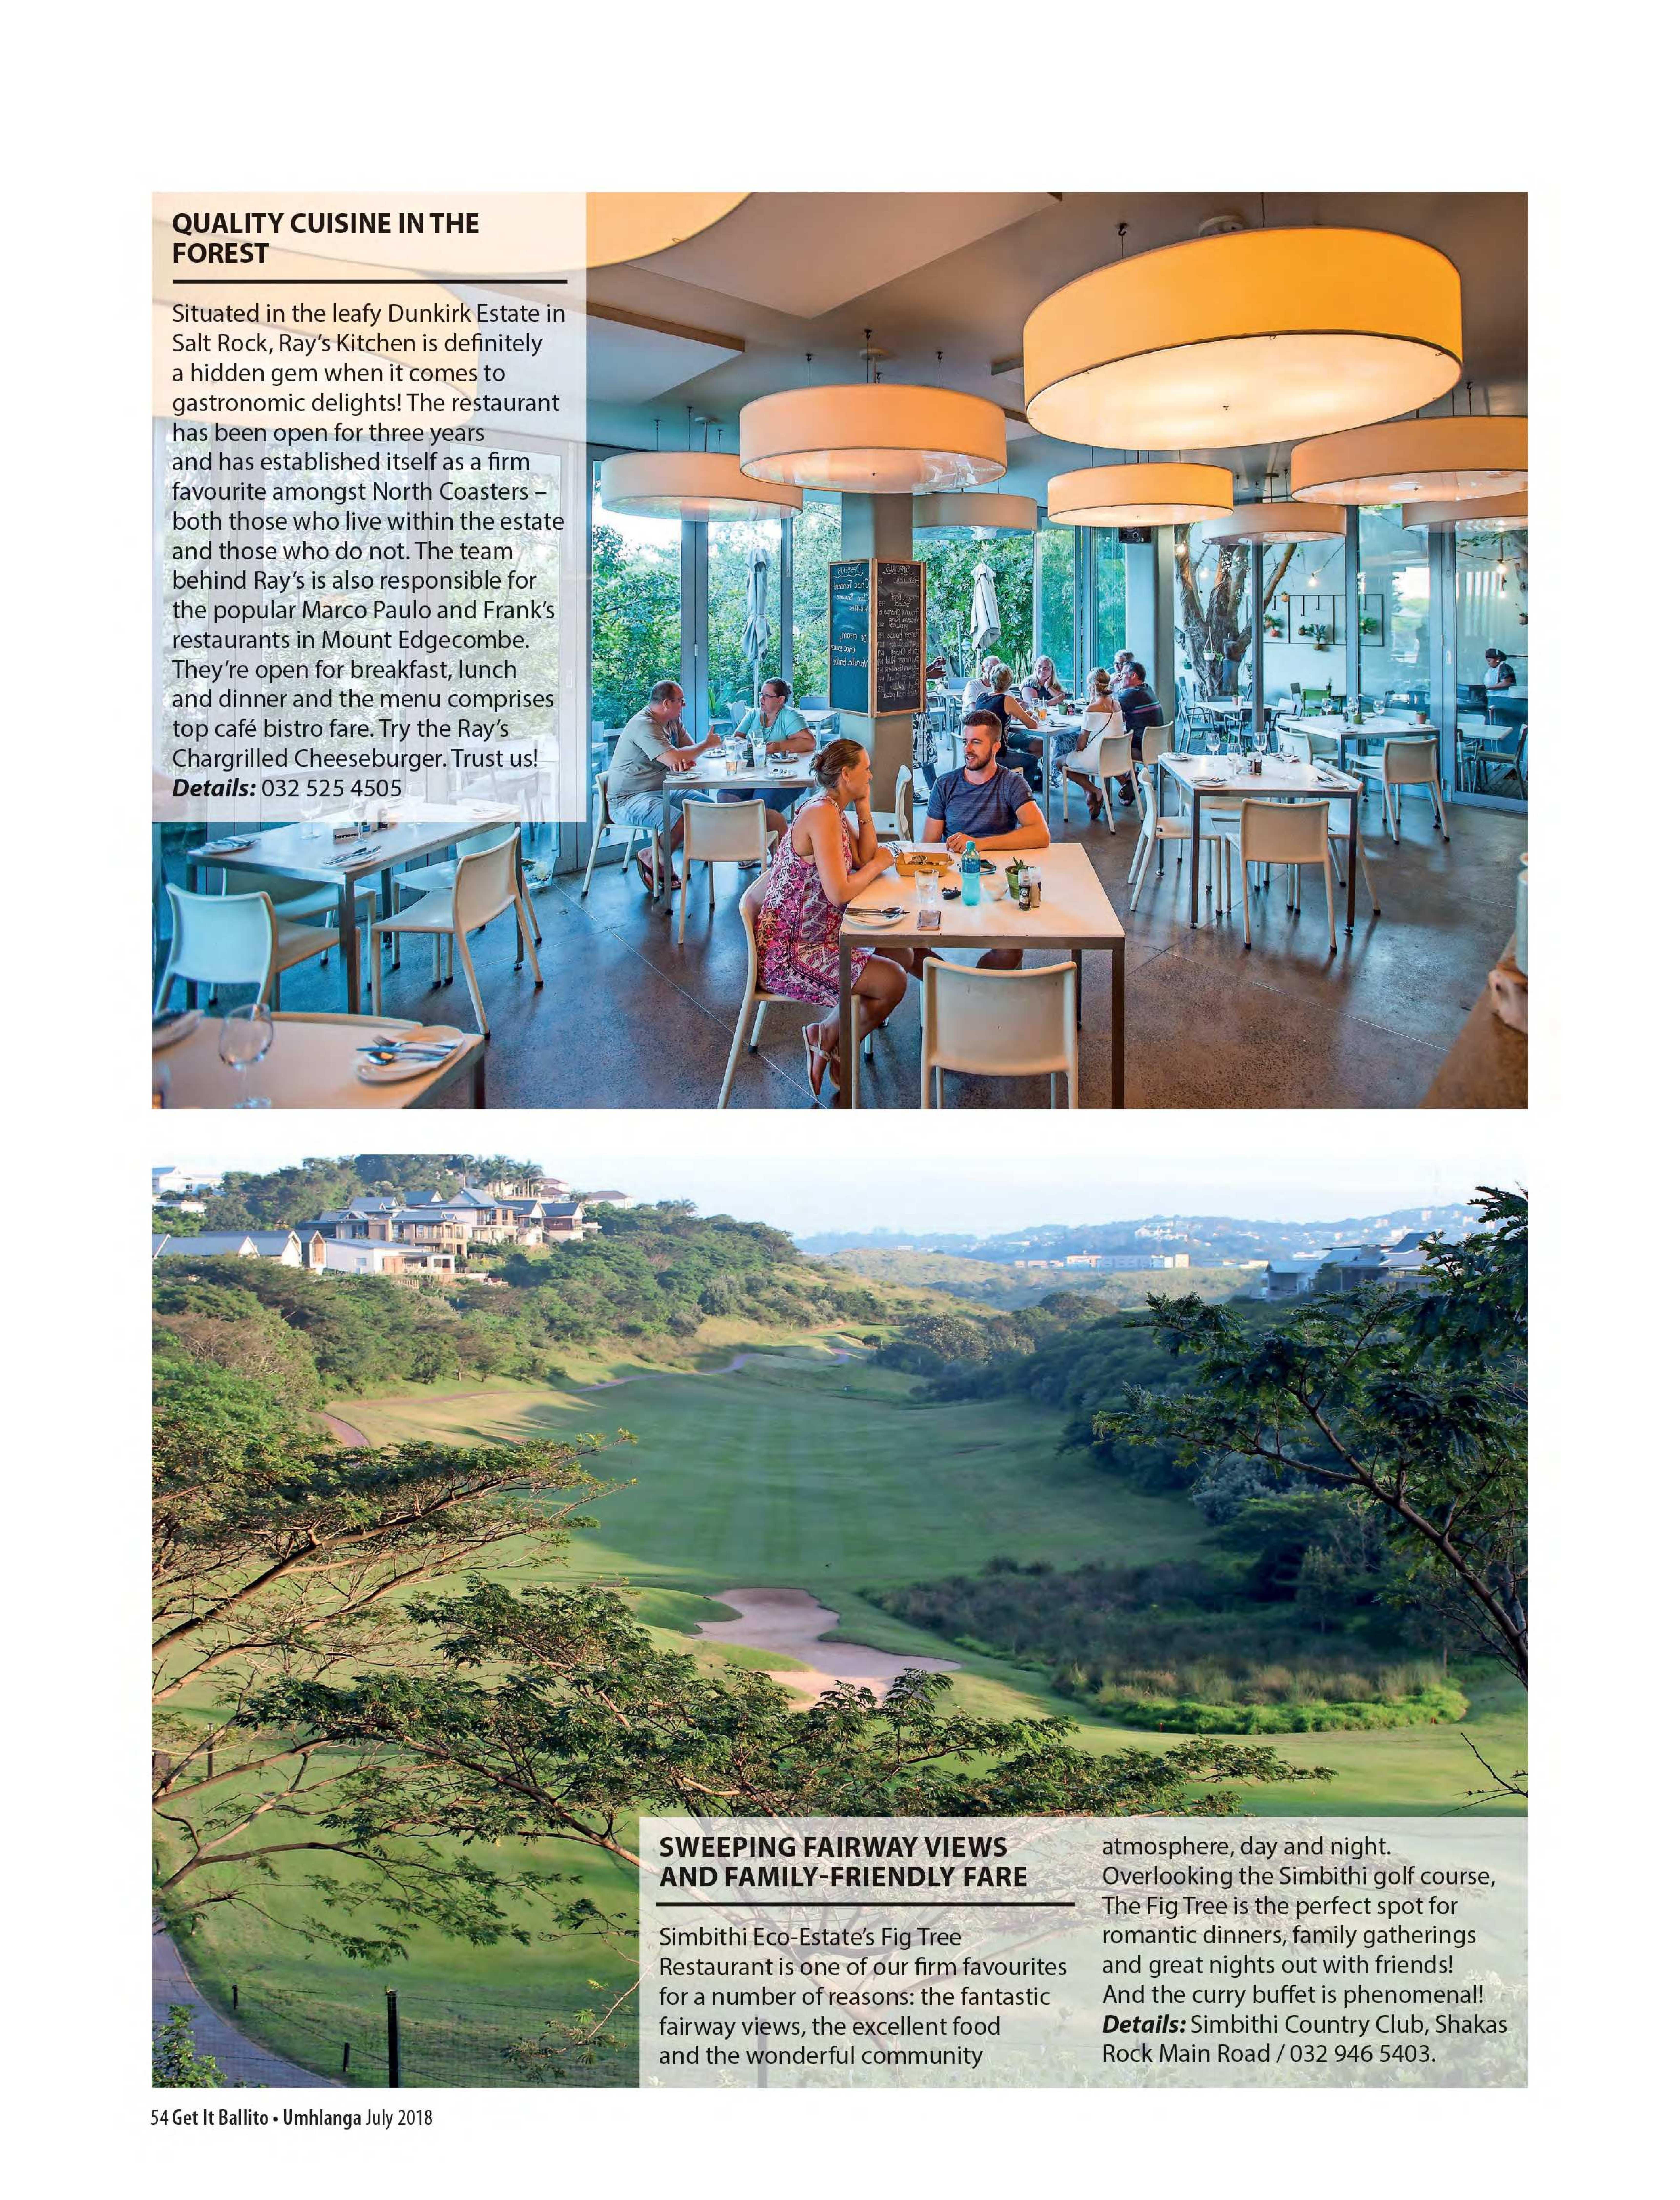 get-magazine-ballitoumhlanga-july-2018-epapers-page-56